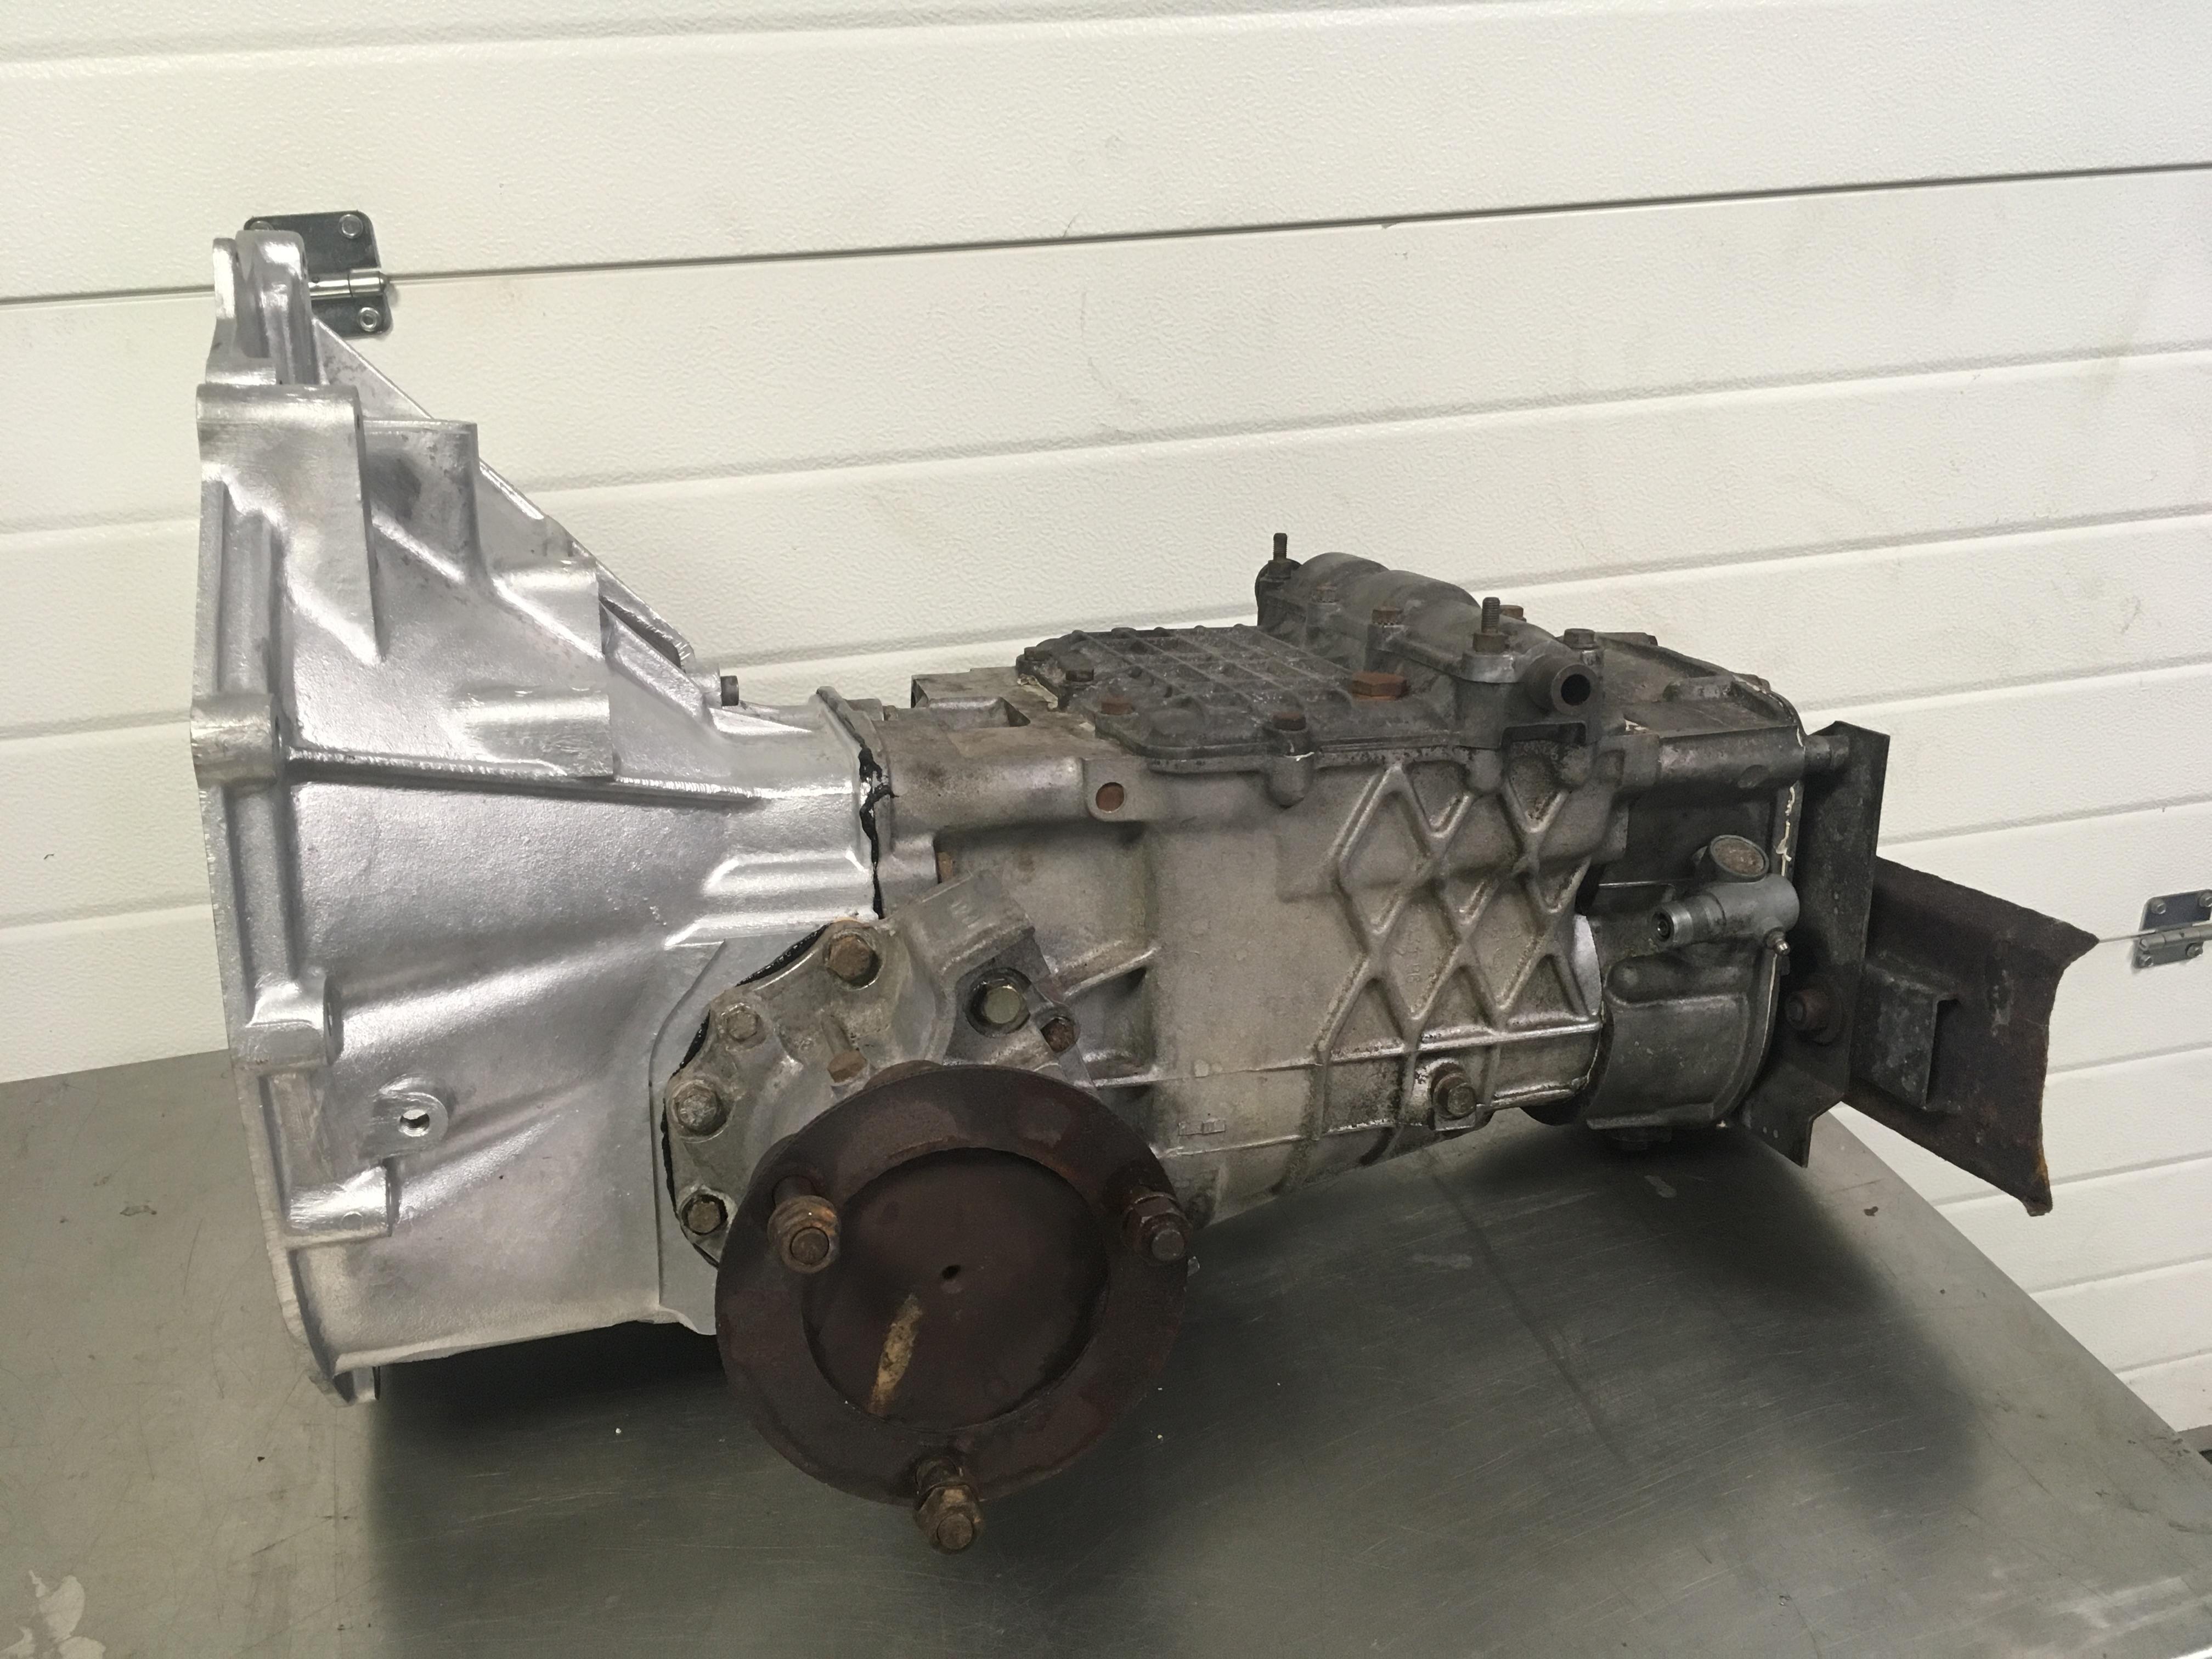 Lotus Esprit Renault UN1 Gearbox finished  - Gearbox Rebuilding Service - V8 S4S S4 SE X180